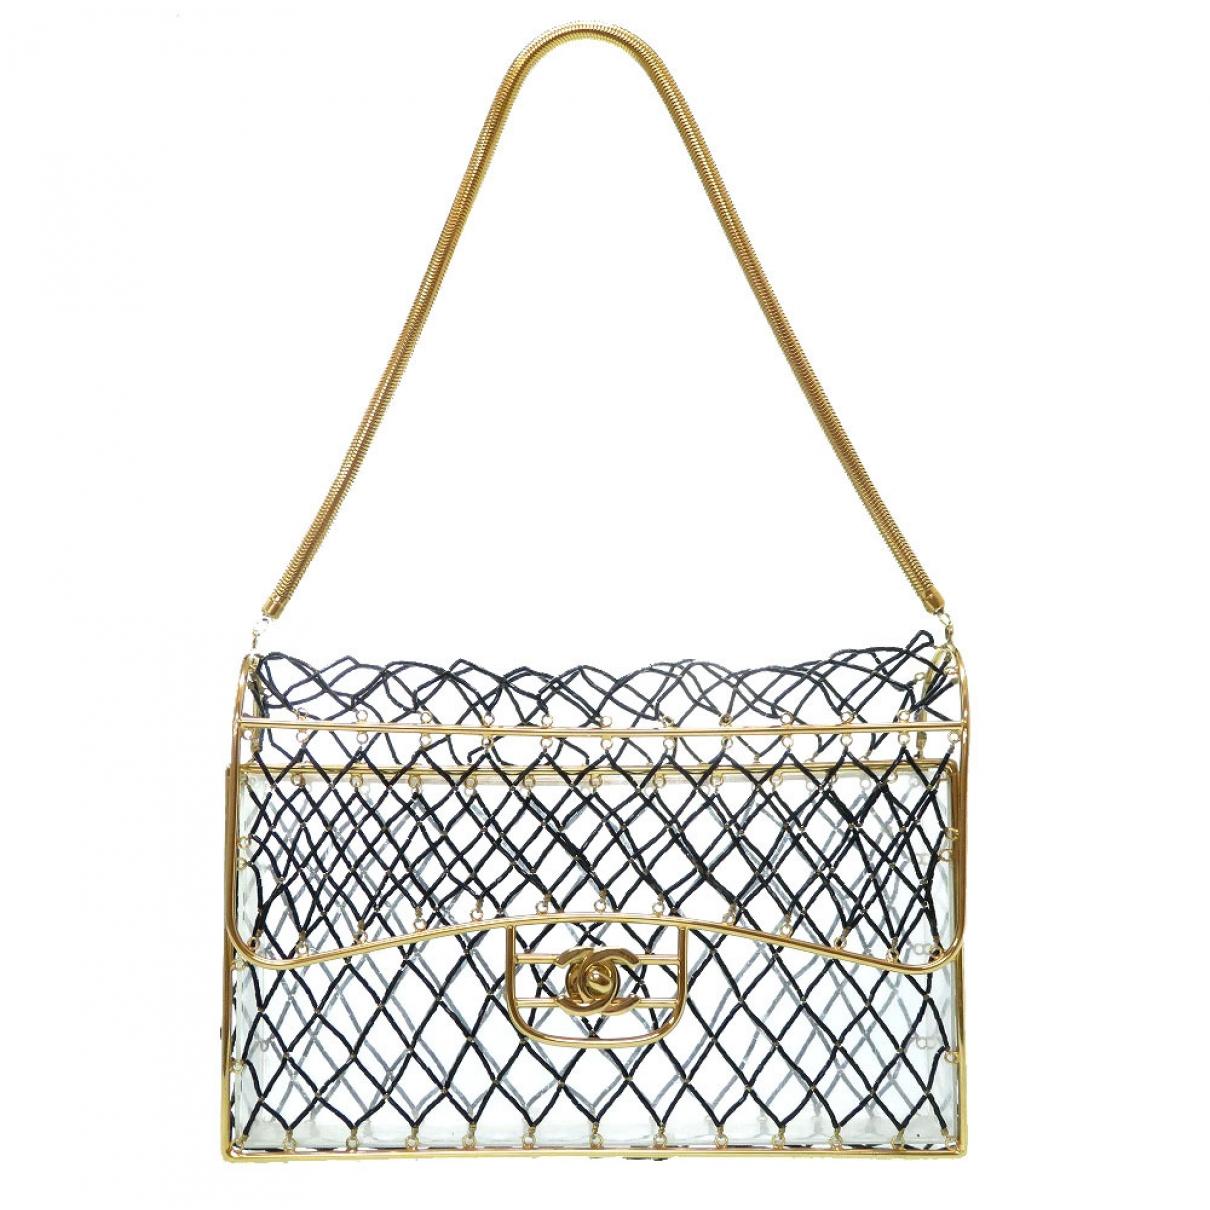 Chanel \N Black handbag for Women \N